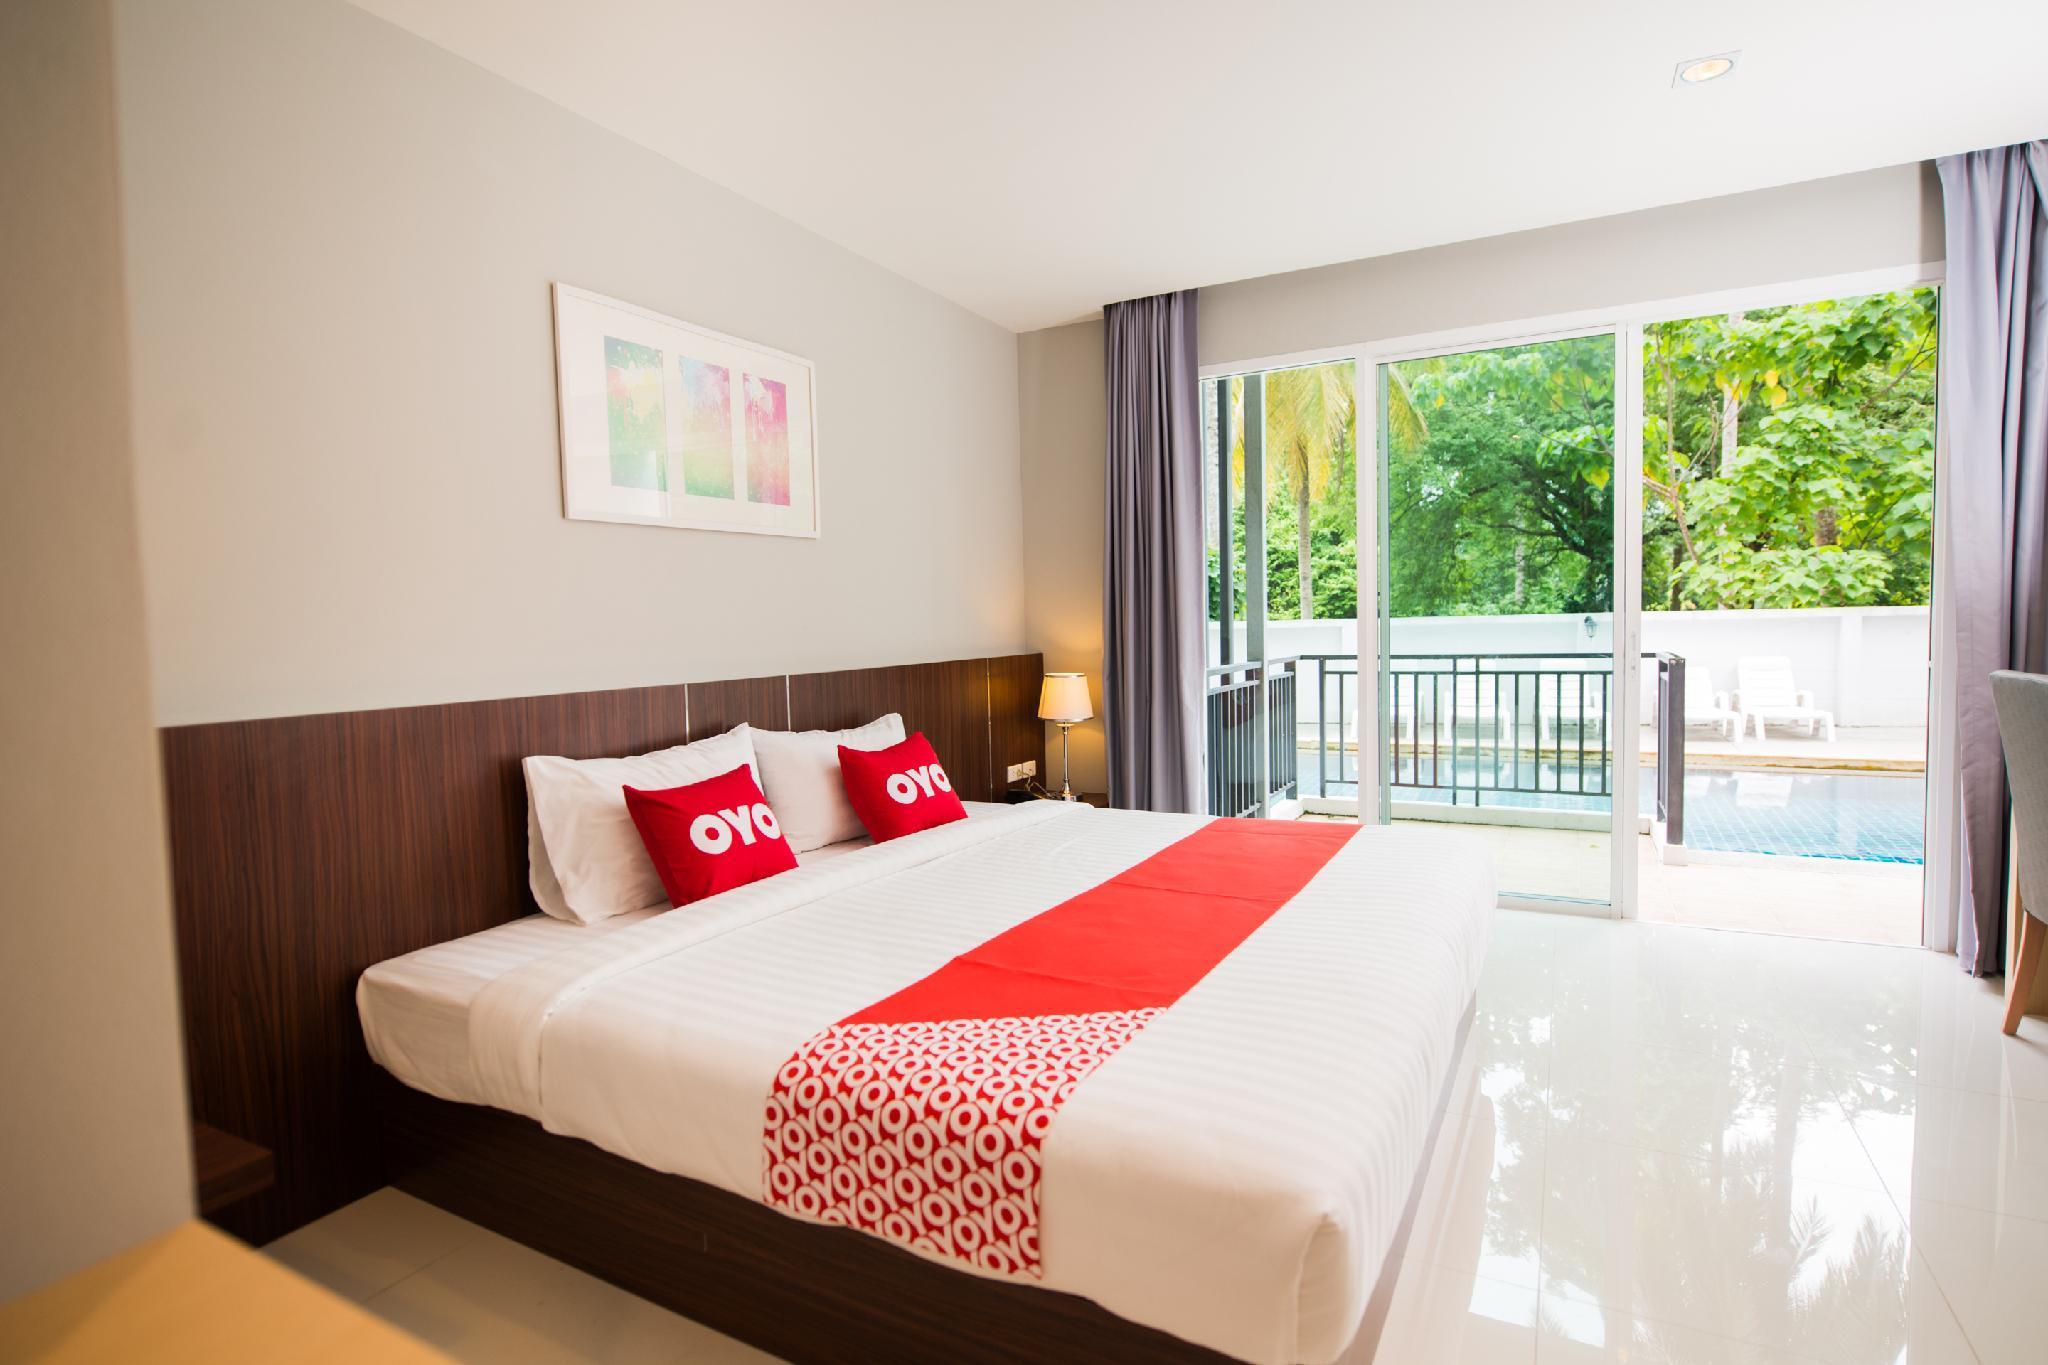 OYO 340 Ahad Suite Ao Nang Hotel